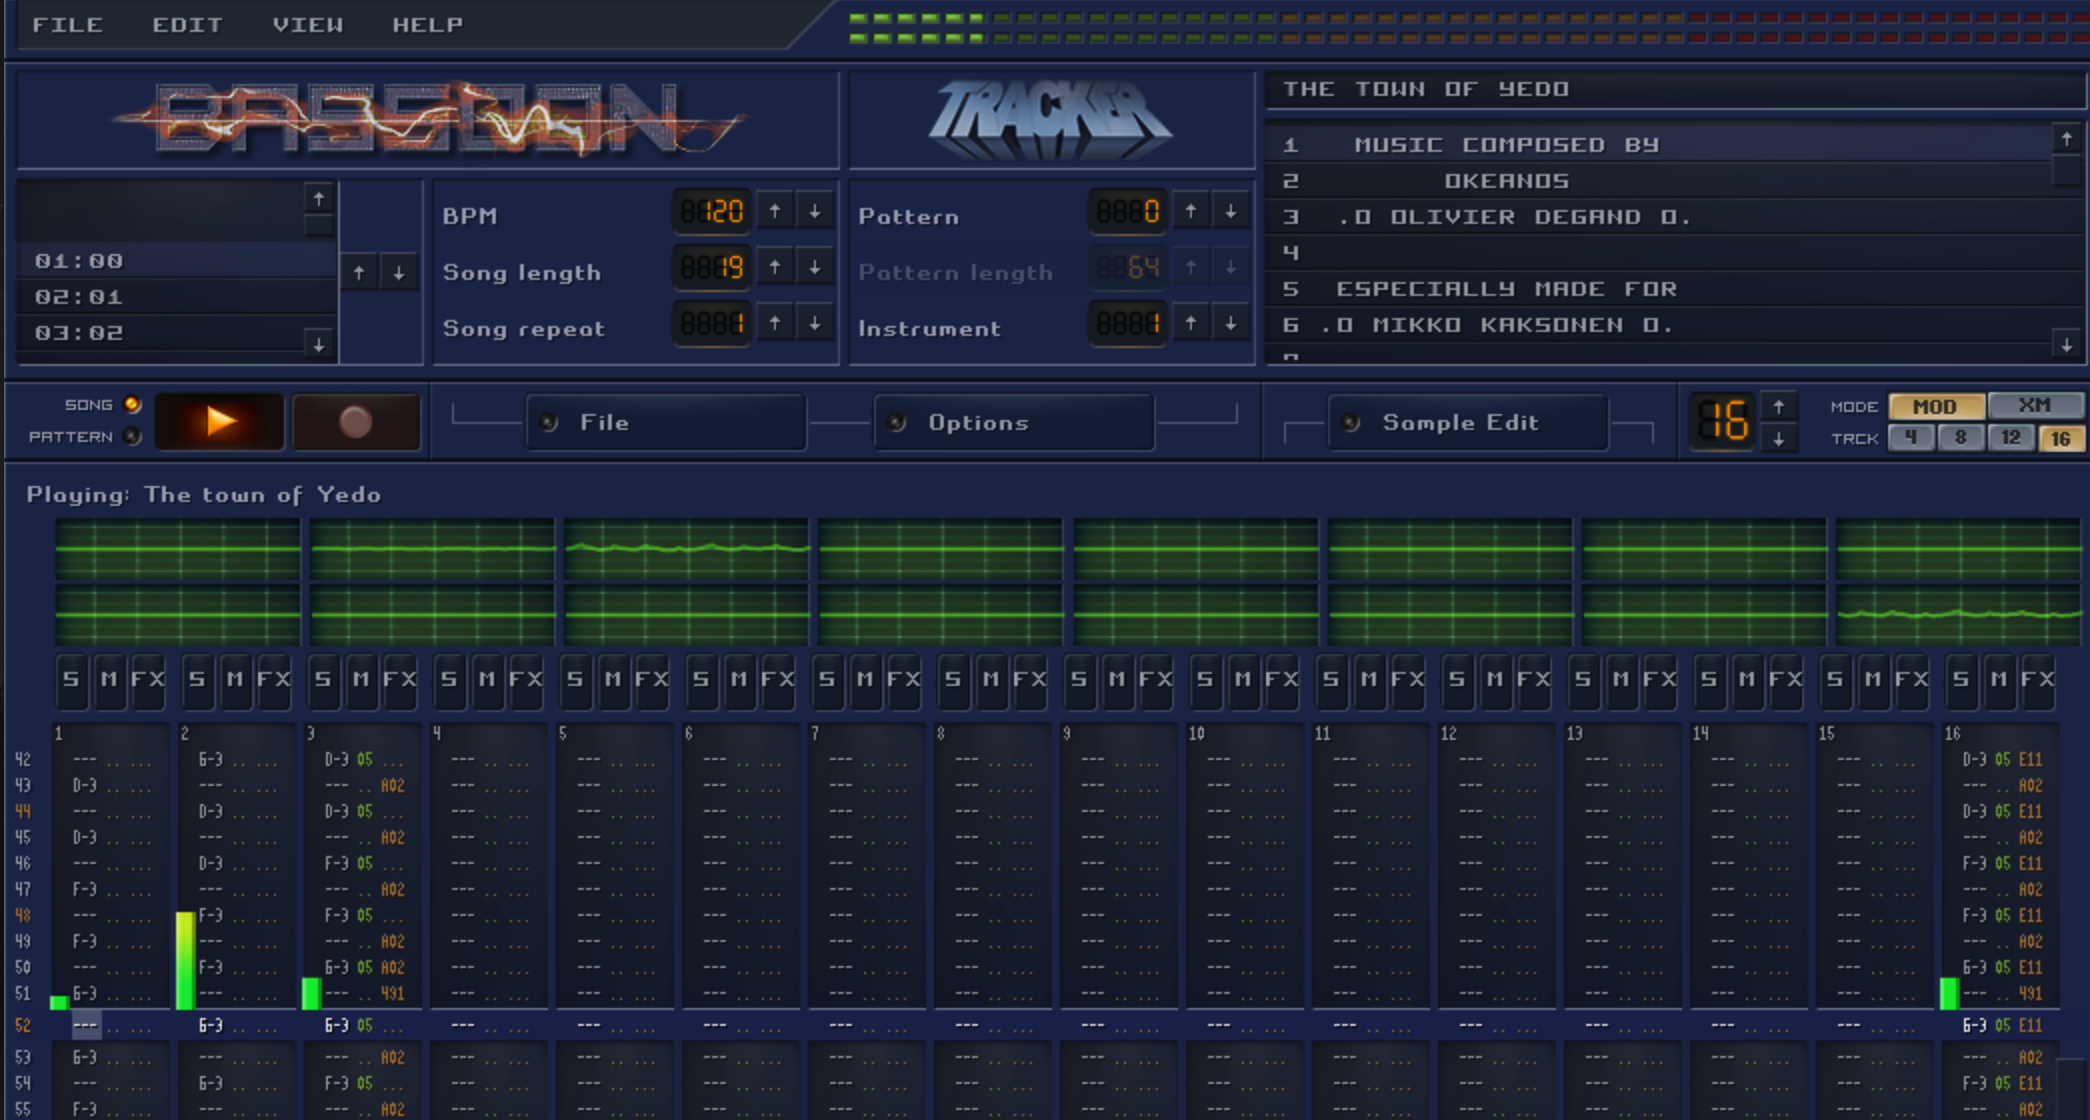 Bassoon Tracker: an Amiga-style music tracker on the web